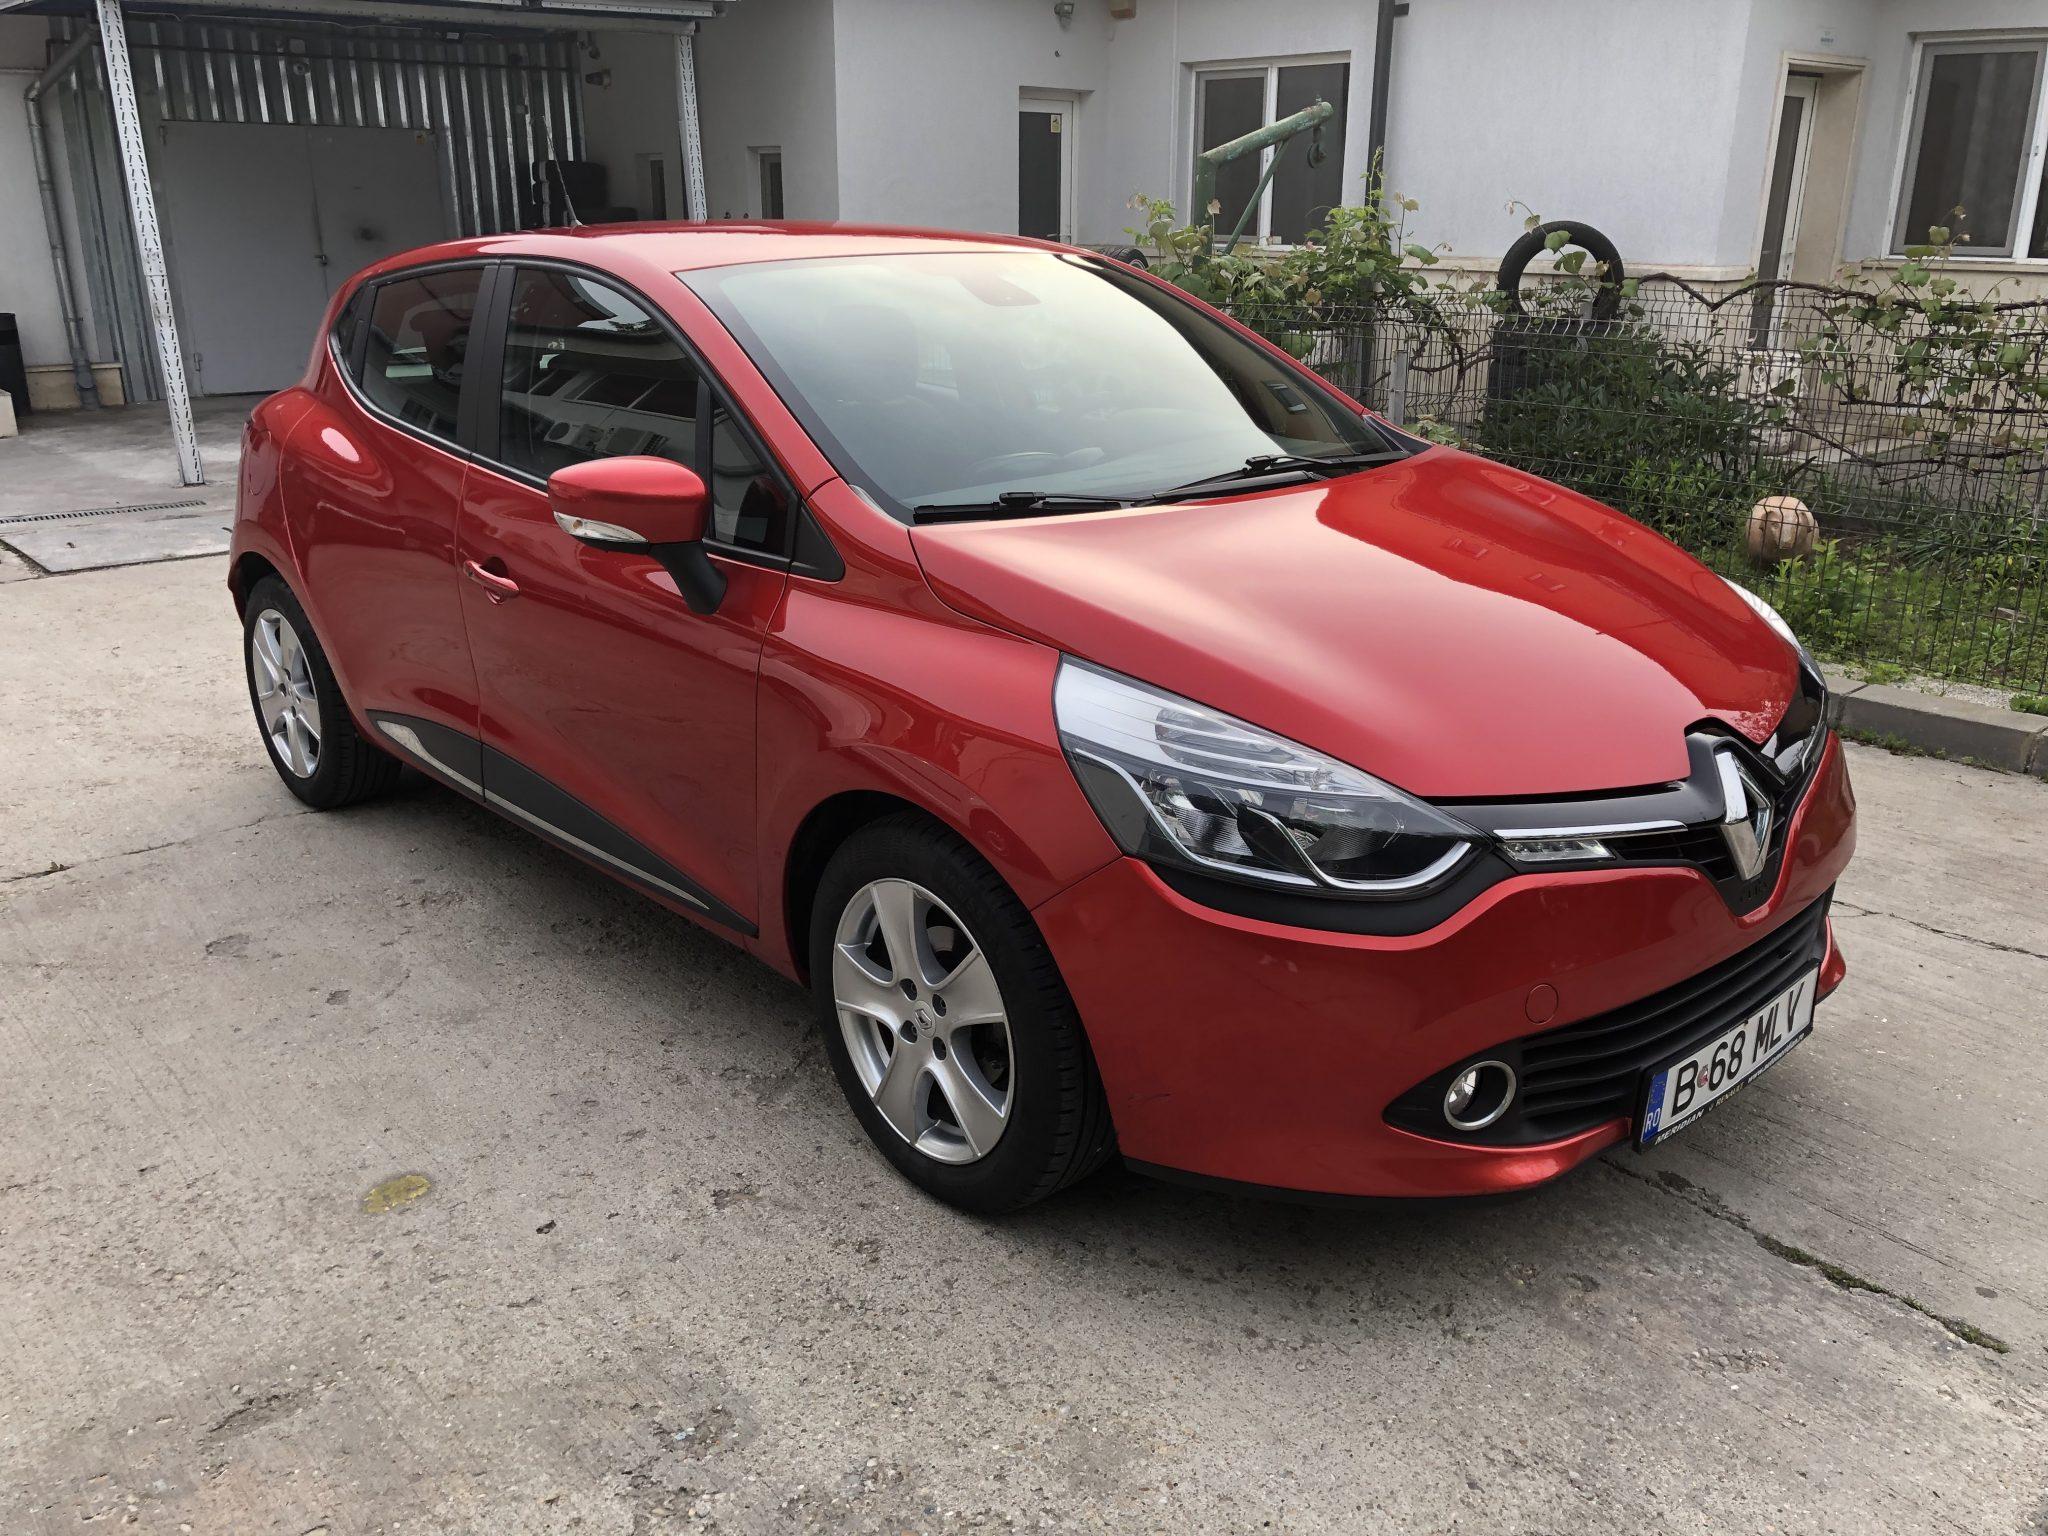 09.05.2019 Poze B-68-MLV Renault Clio (3)